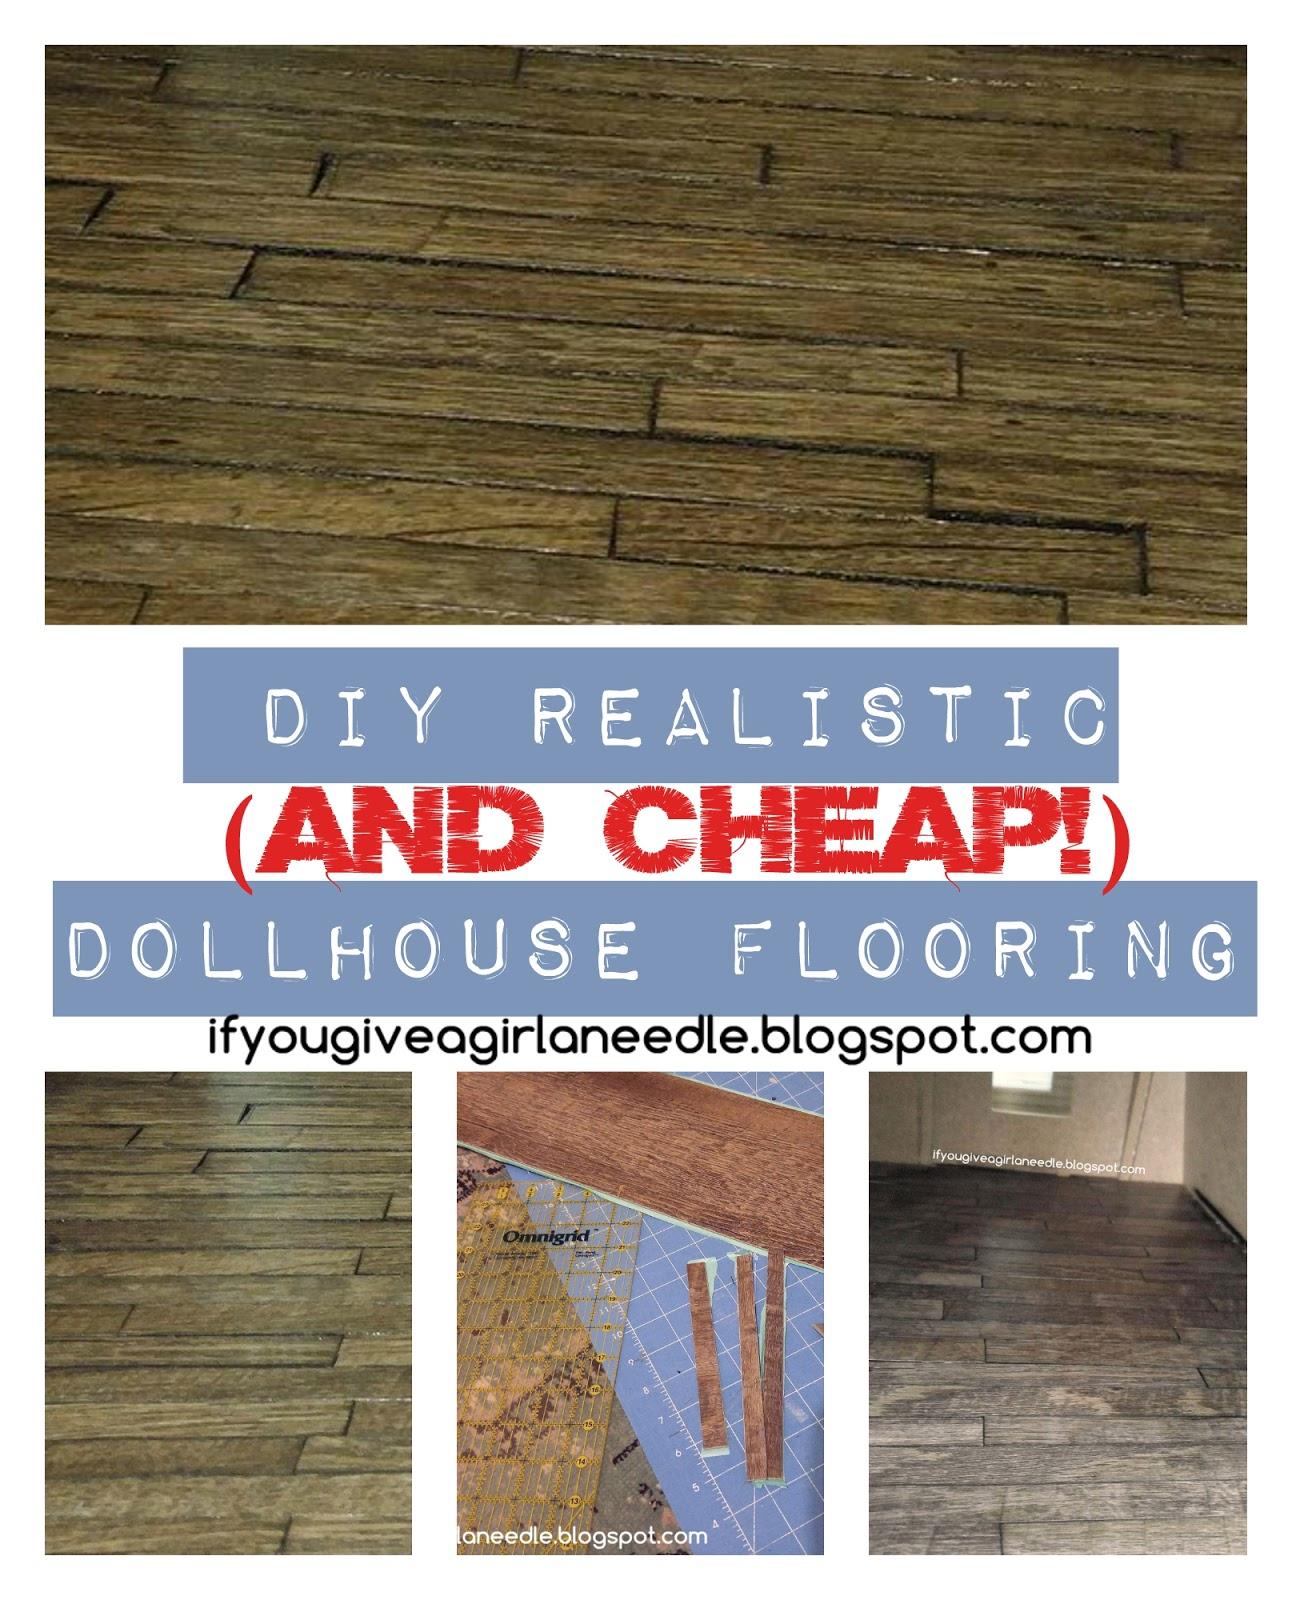 If You Give A Girl A Needle Diy Dollhouse Hardwood Flooring